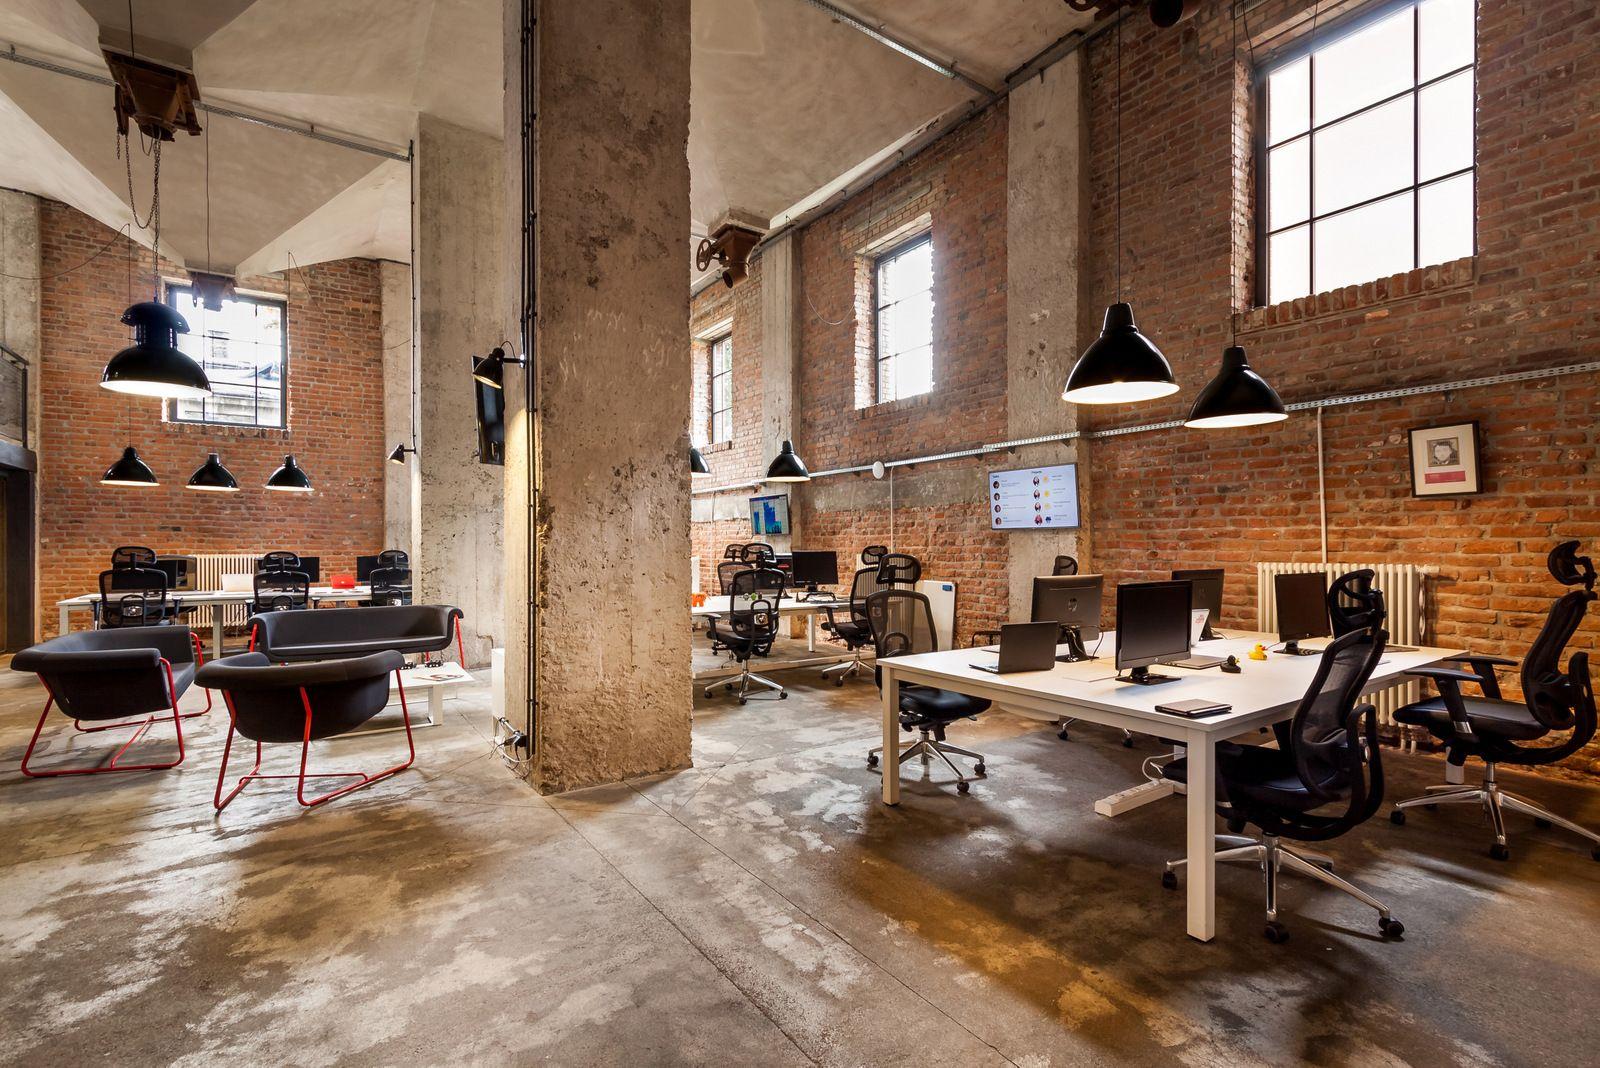 Desain interior industrial pada kantor startup - source: pinterest.ph